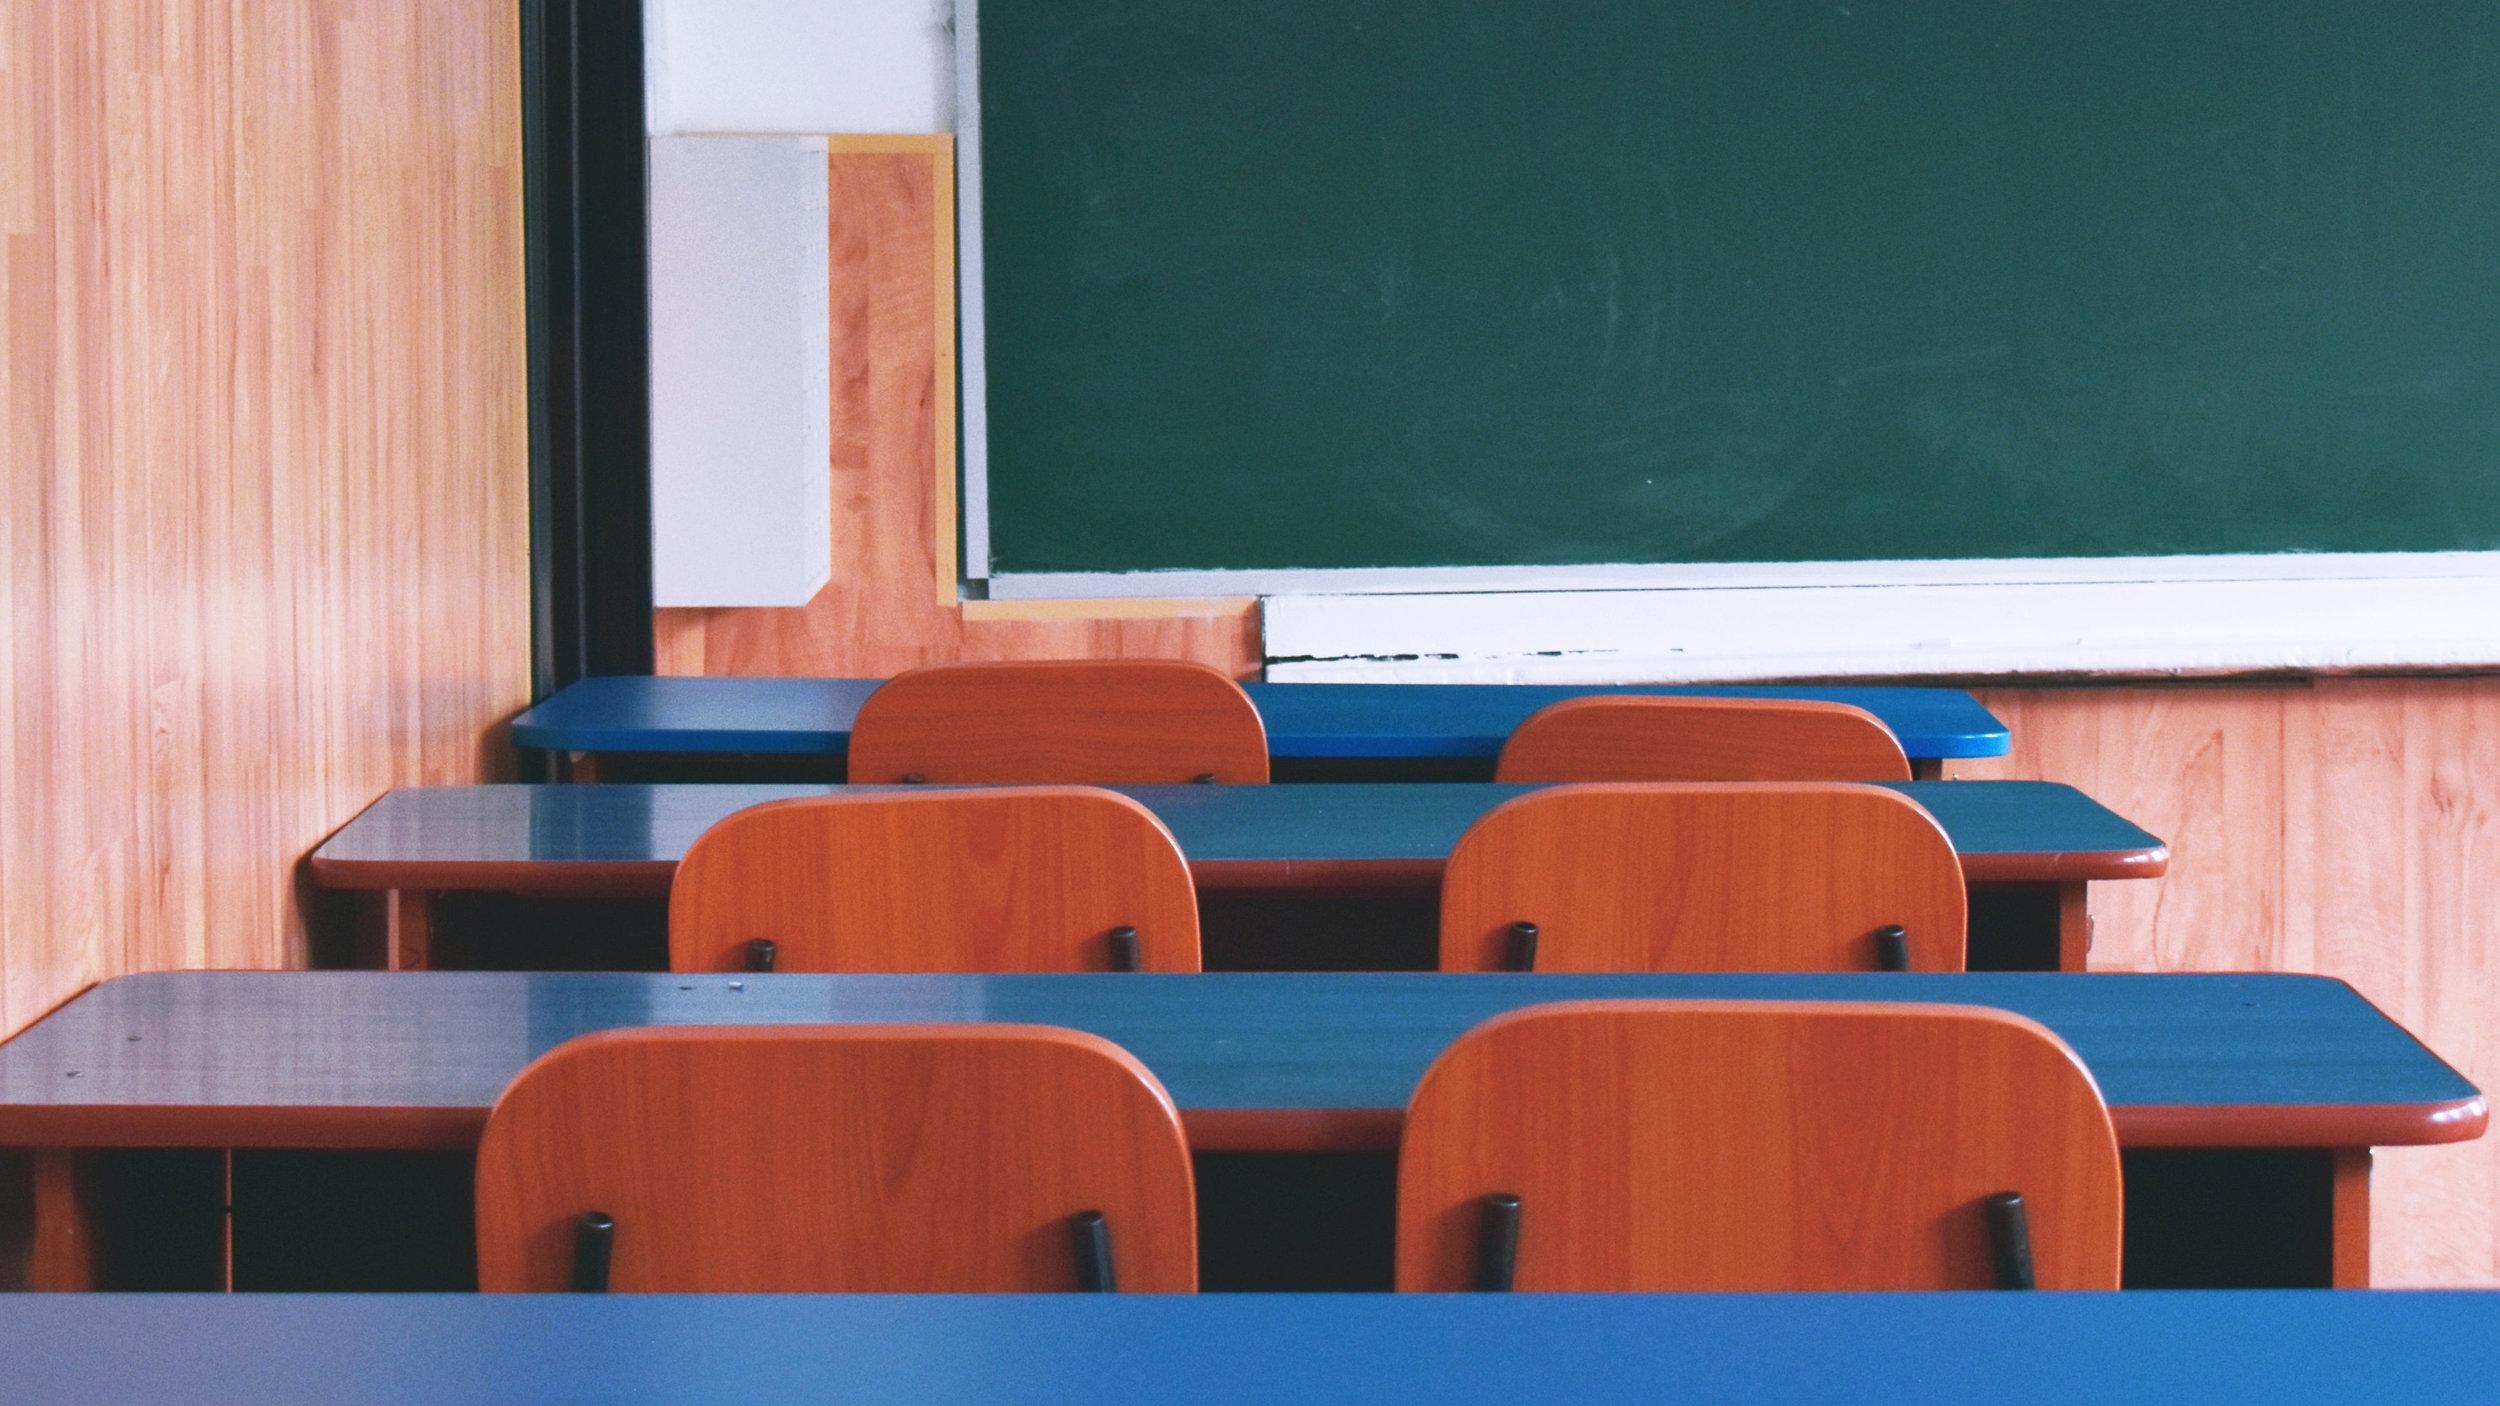 chairs-classroom-desks-2675050.jpg